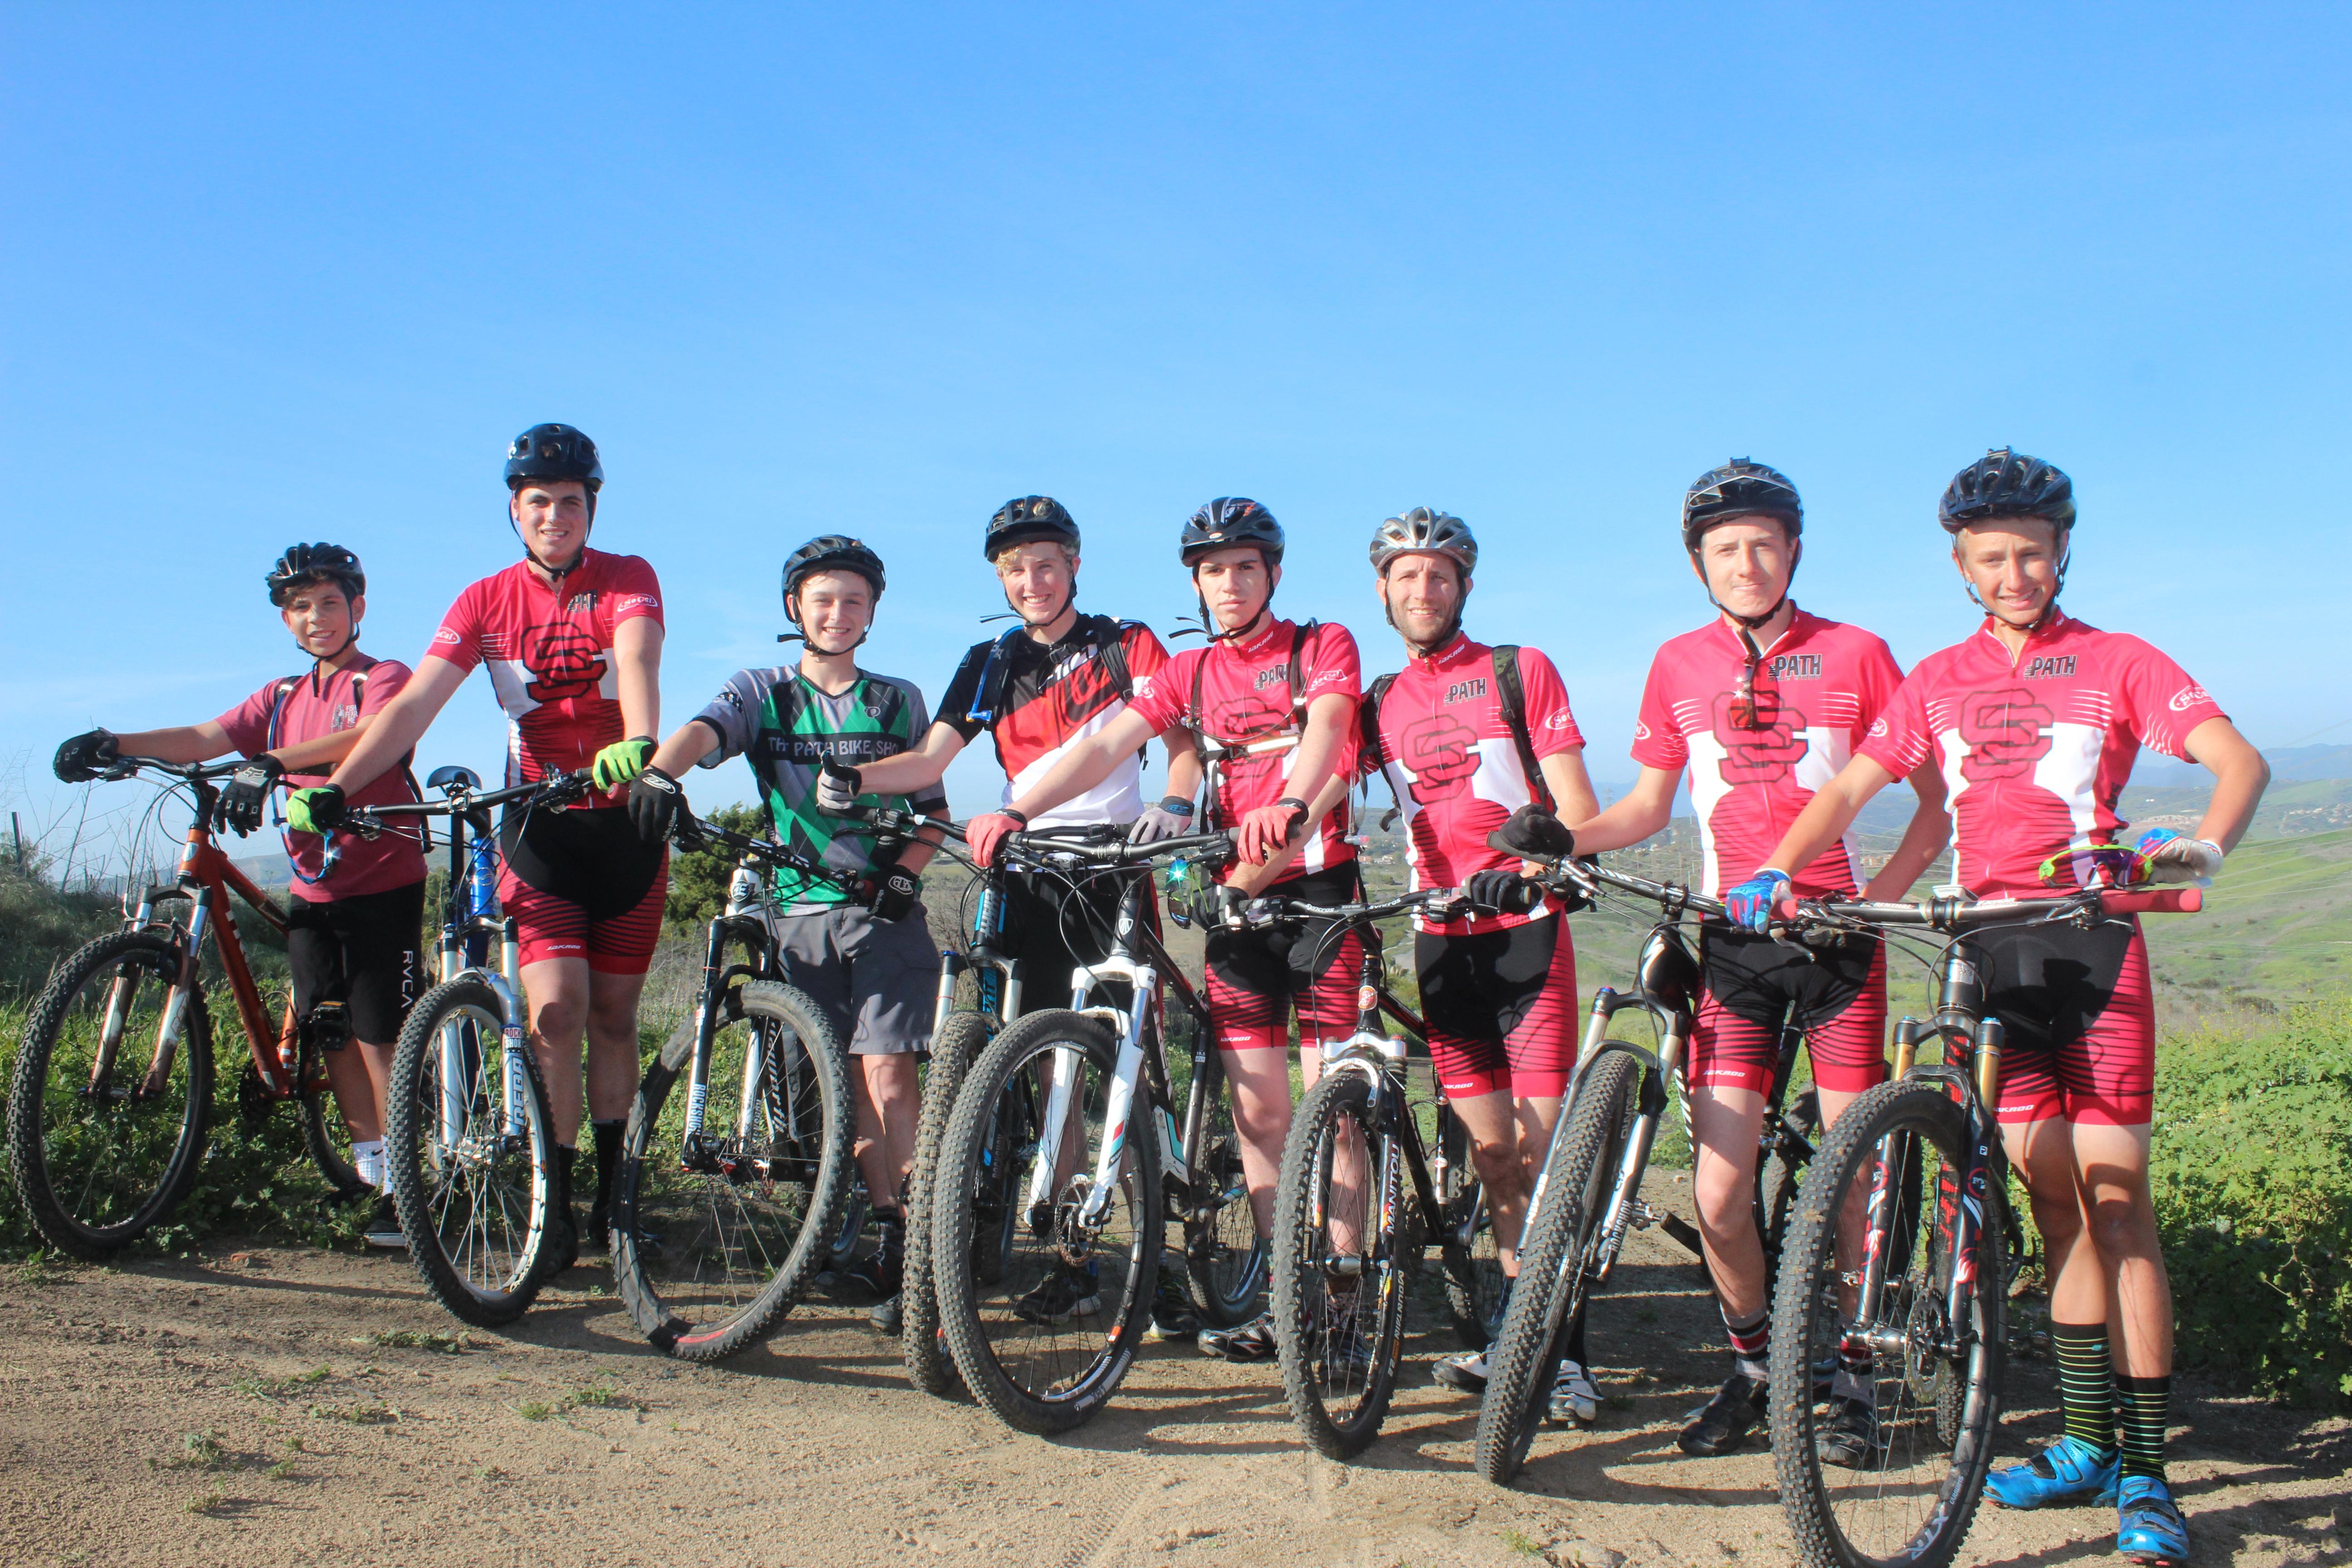 The San Clemente Mountain Bike Team began its inaugural season competing in the SoCal High School Cycling League in 2016. Photo: Steve Breazeale